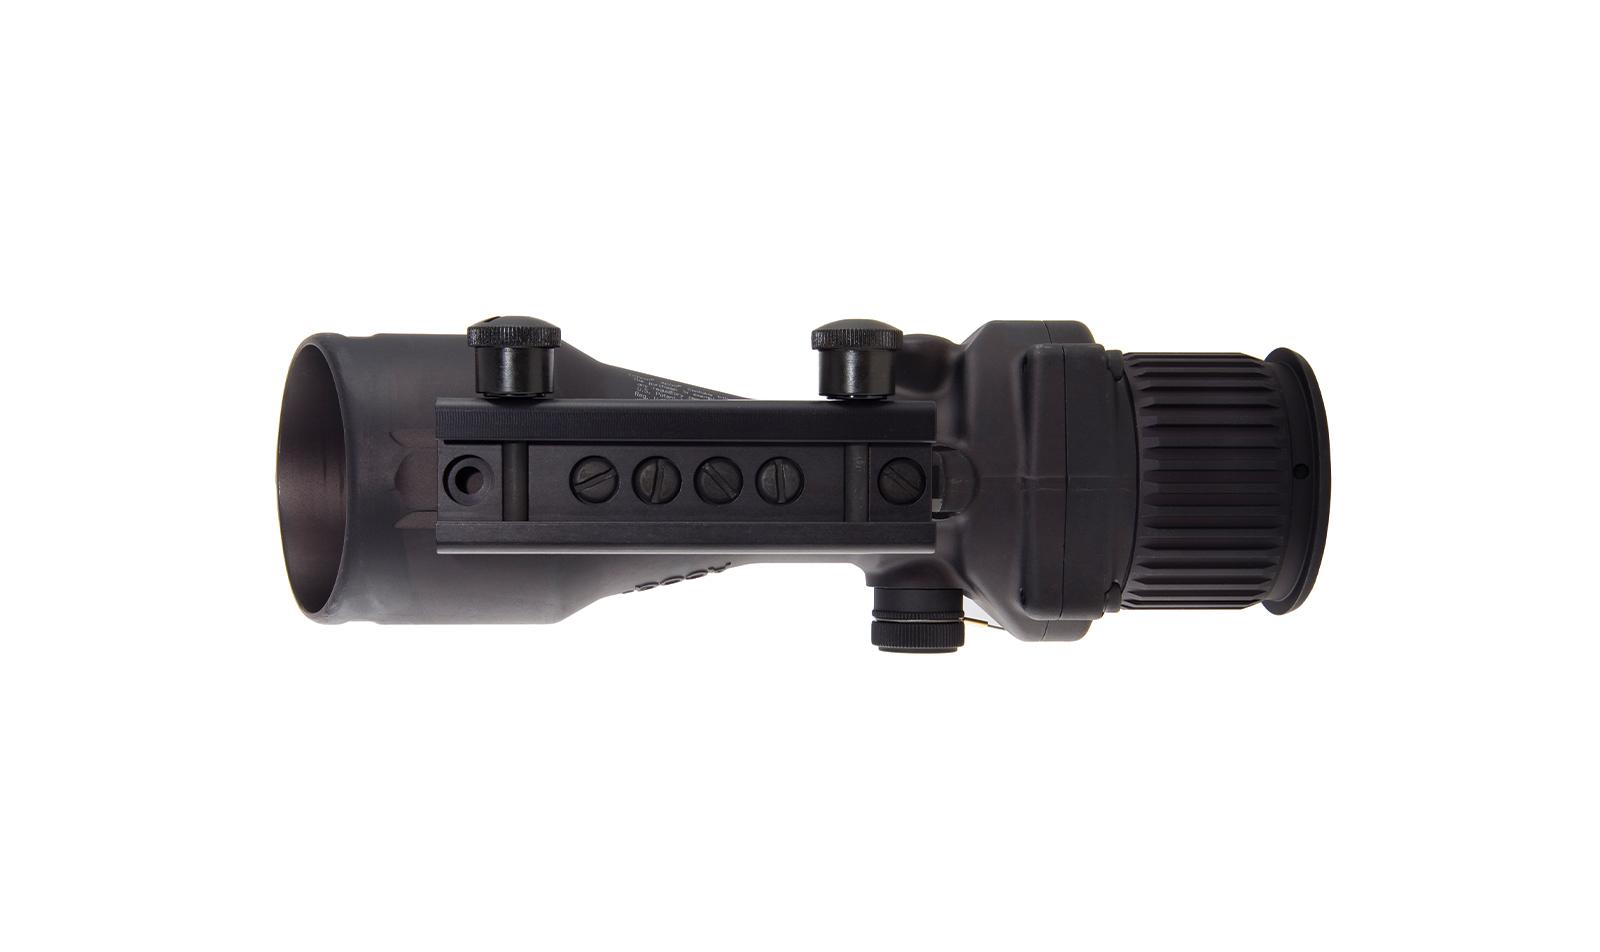 TA648-D-100559 angle 10